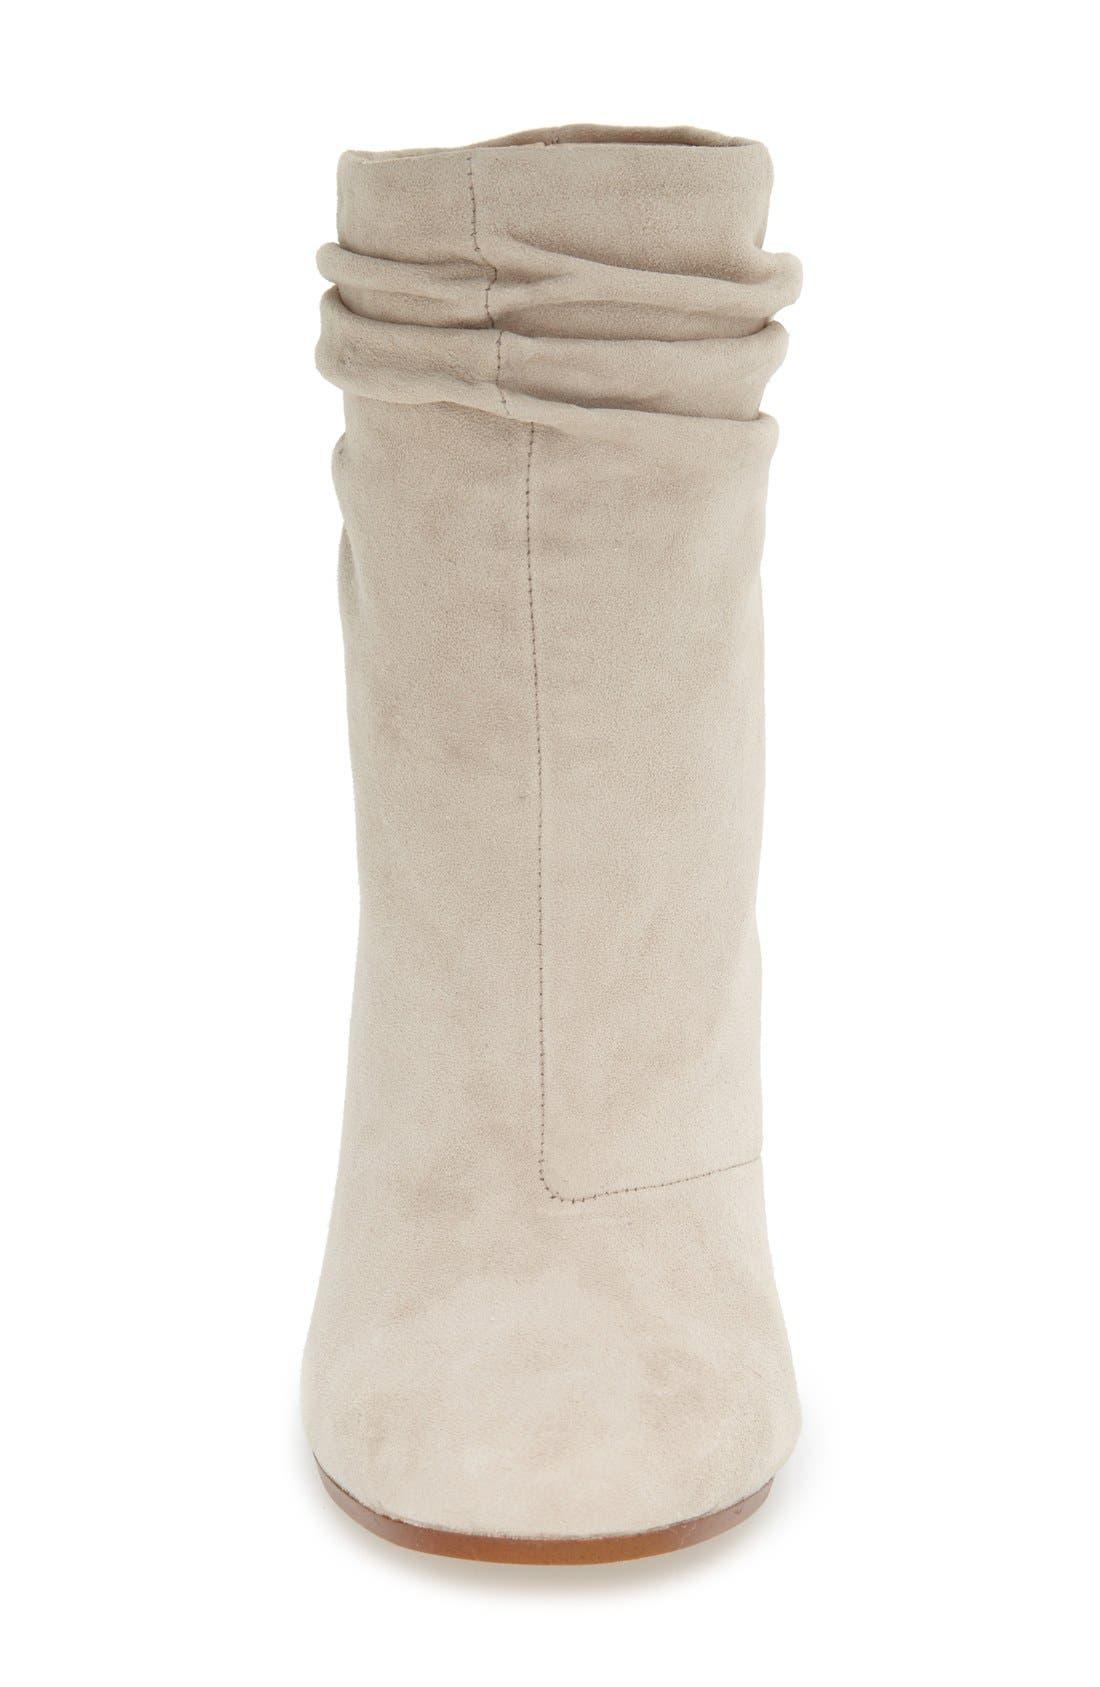 Alternate Image 3  - Kristin Cavallari 'Georgie' Block Heel Boot (Women)